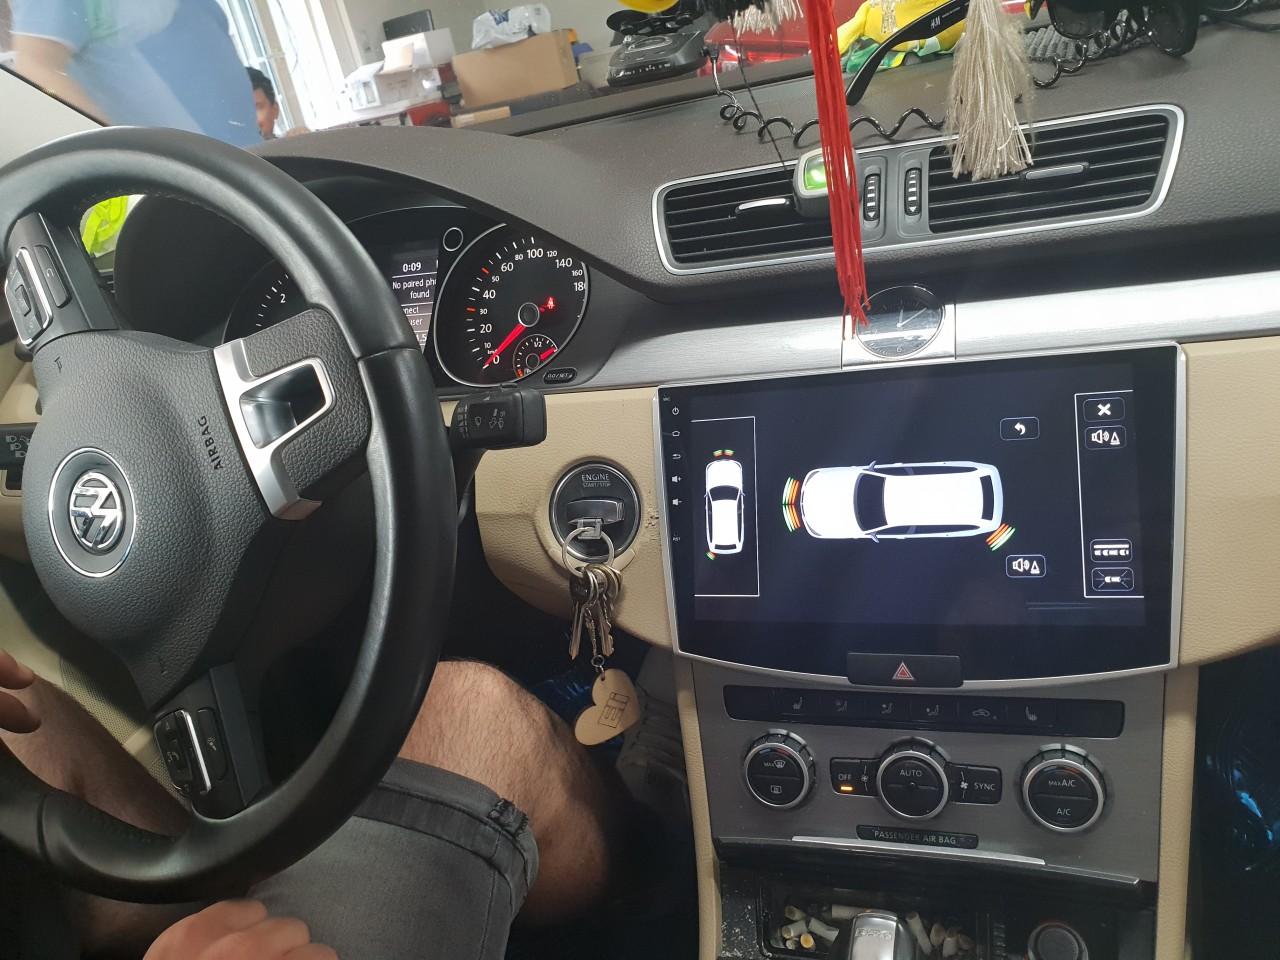 NAVIGATIE CARPAD ANDROID 7.1 DEDICATA VW PASSAT B6 TABLETA 10.1'' INTERNET 4G WIFI DVR GPS WAZE